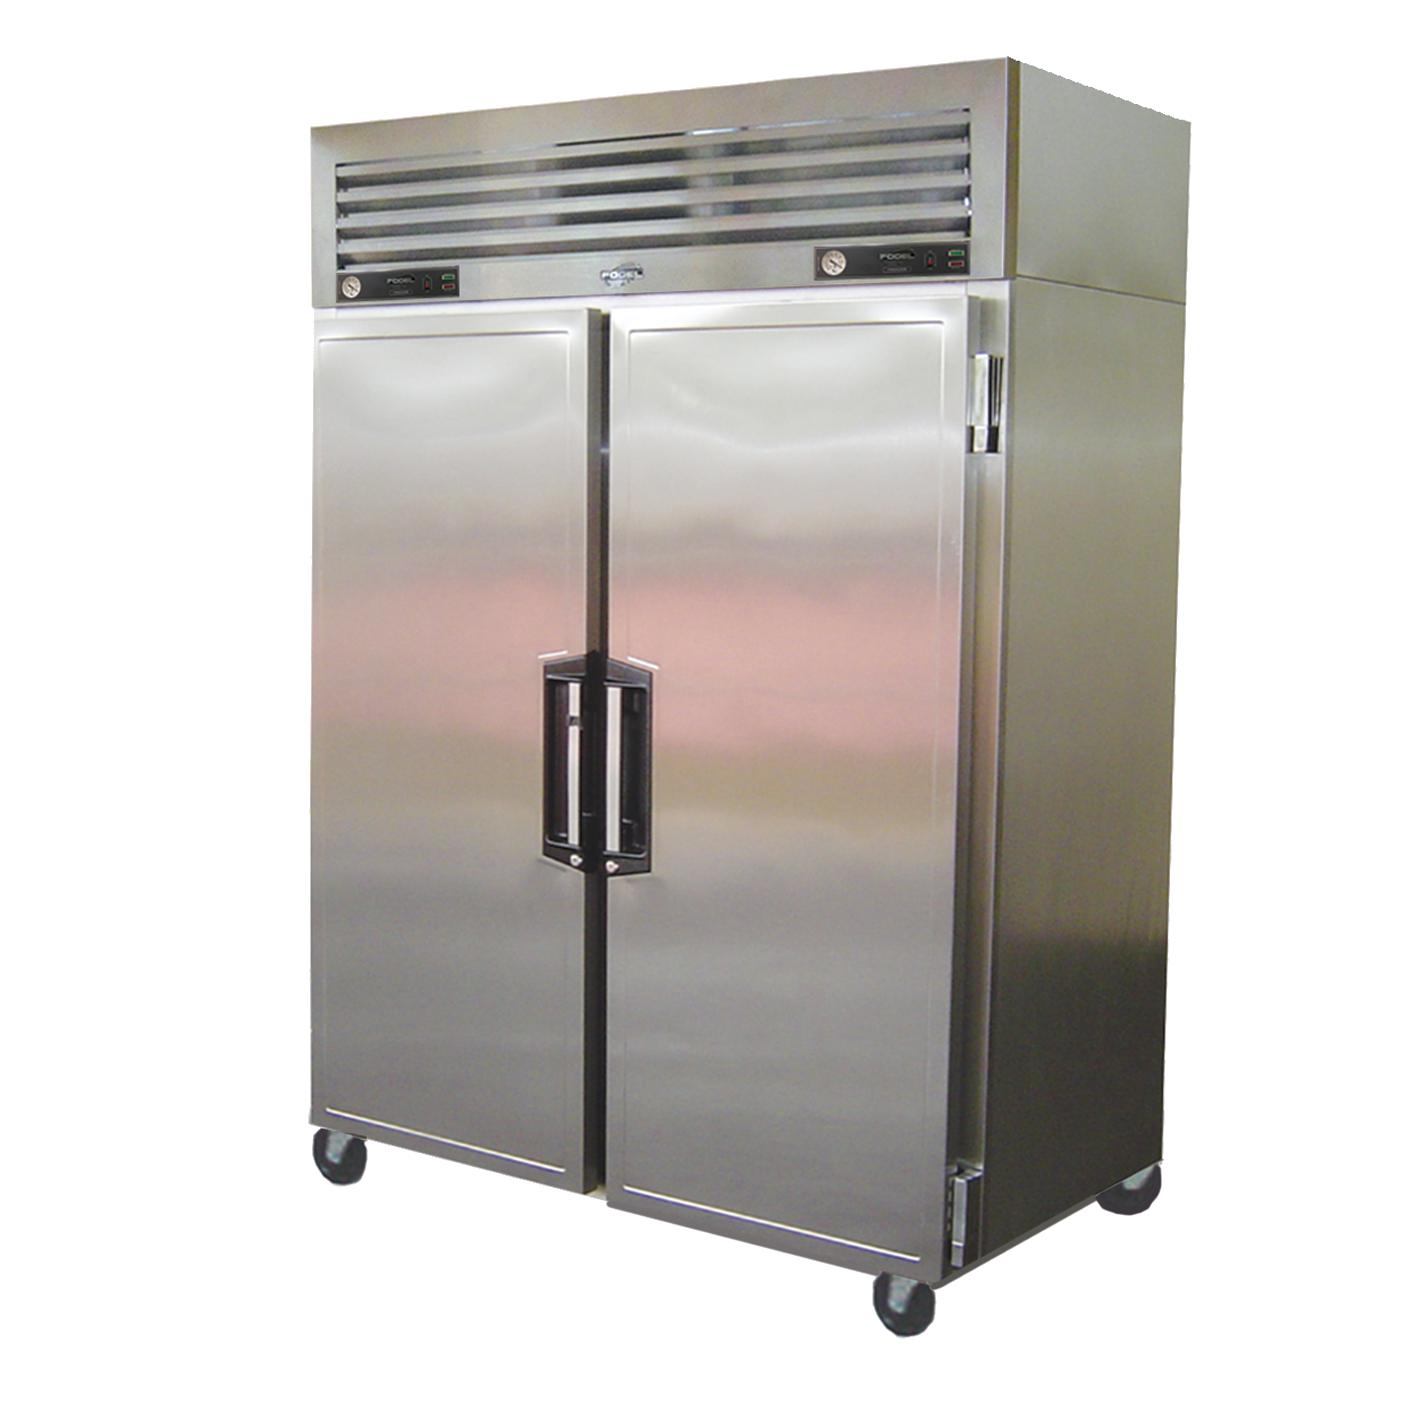 Fogel USA SKT-22/22-FA refrigerator freezer, reach-in